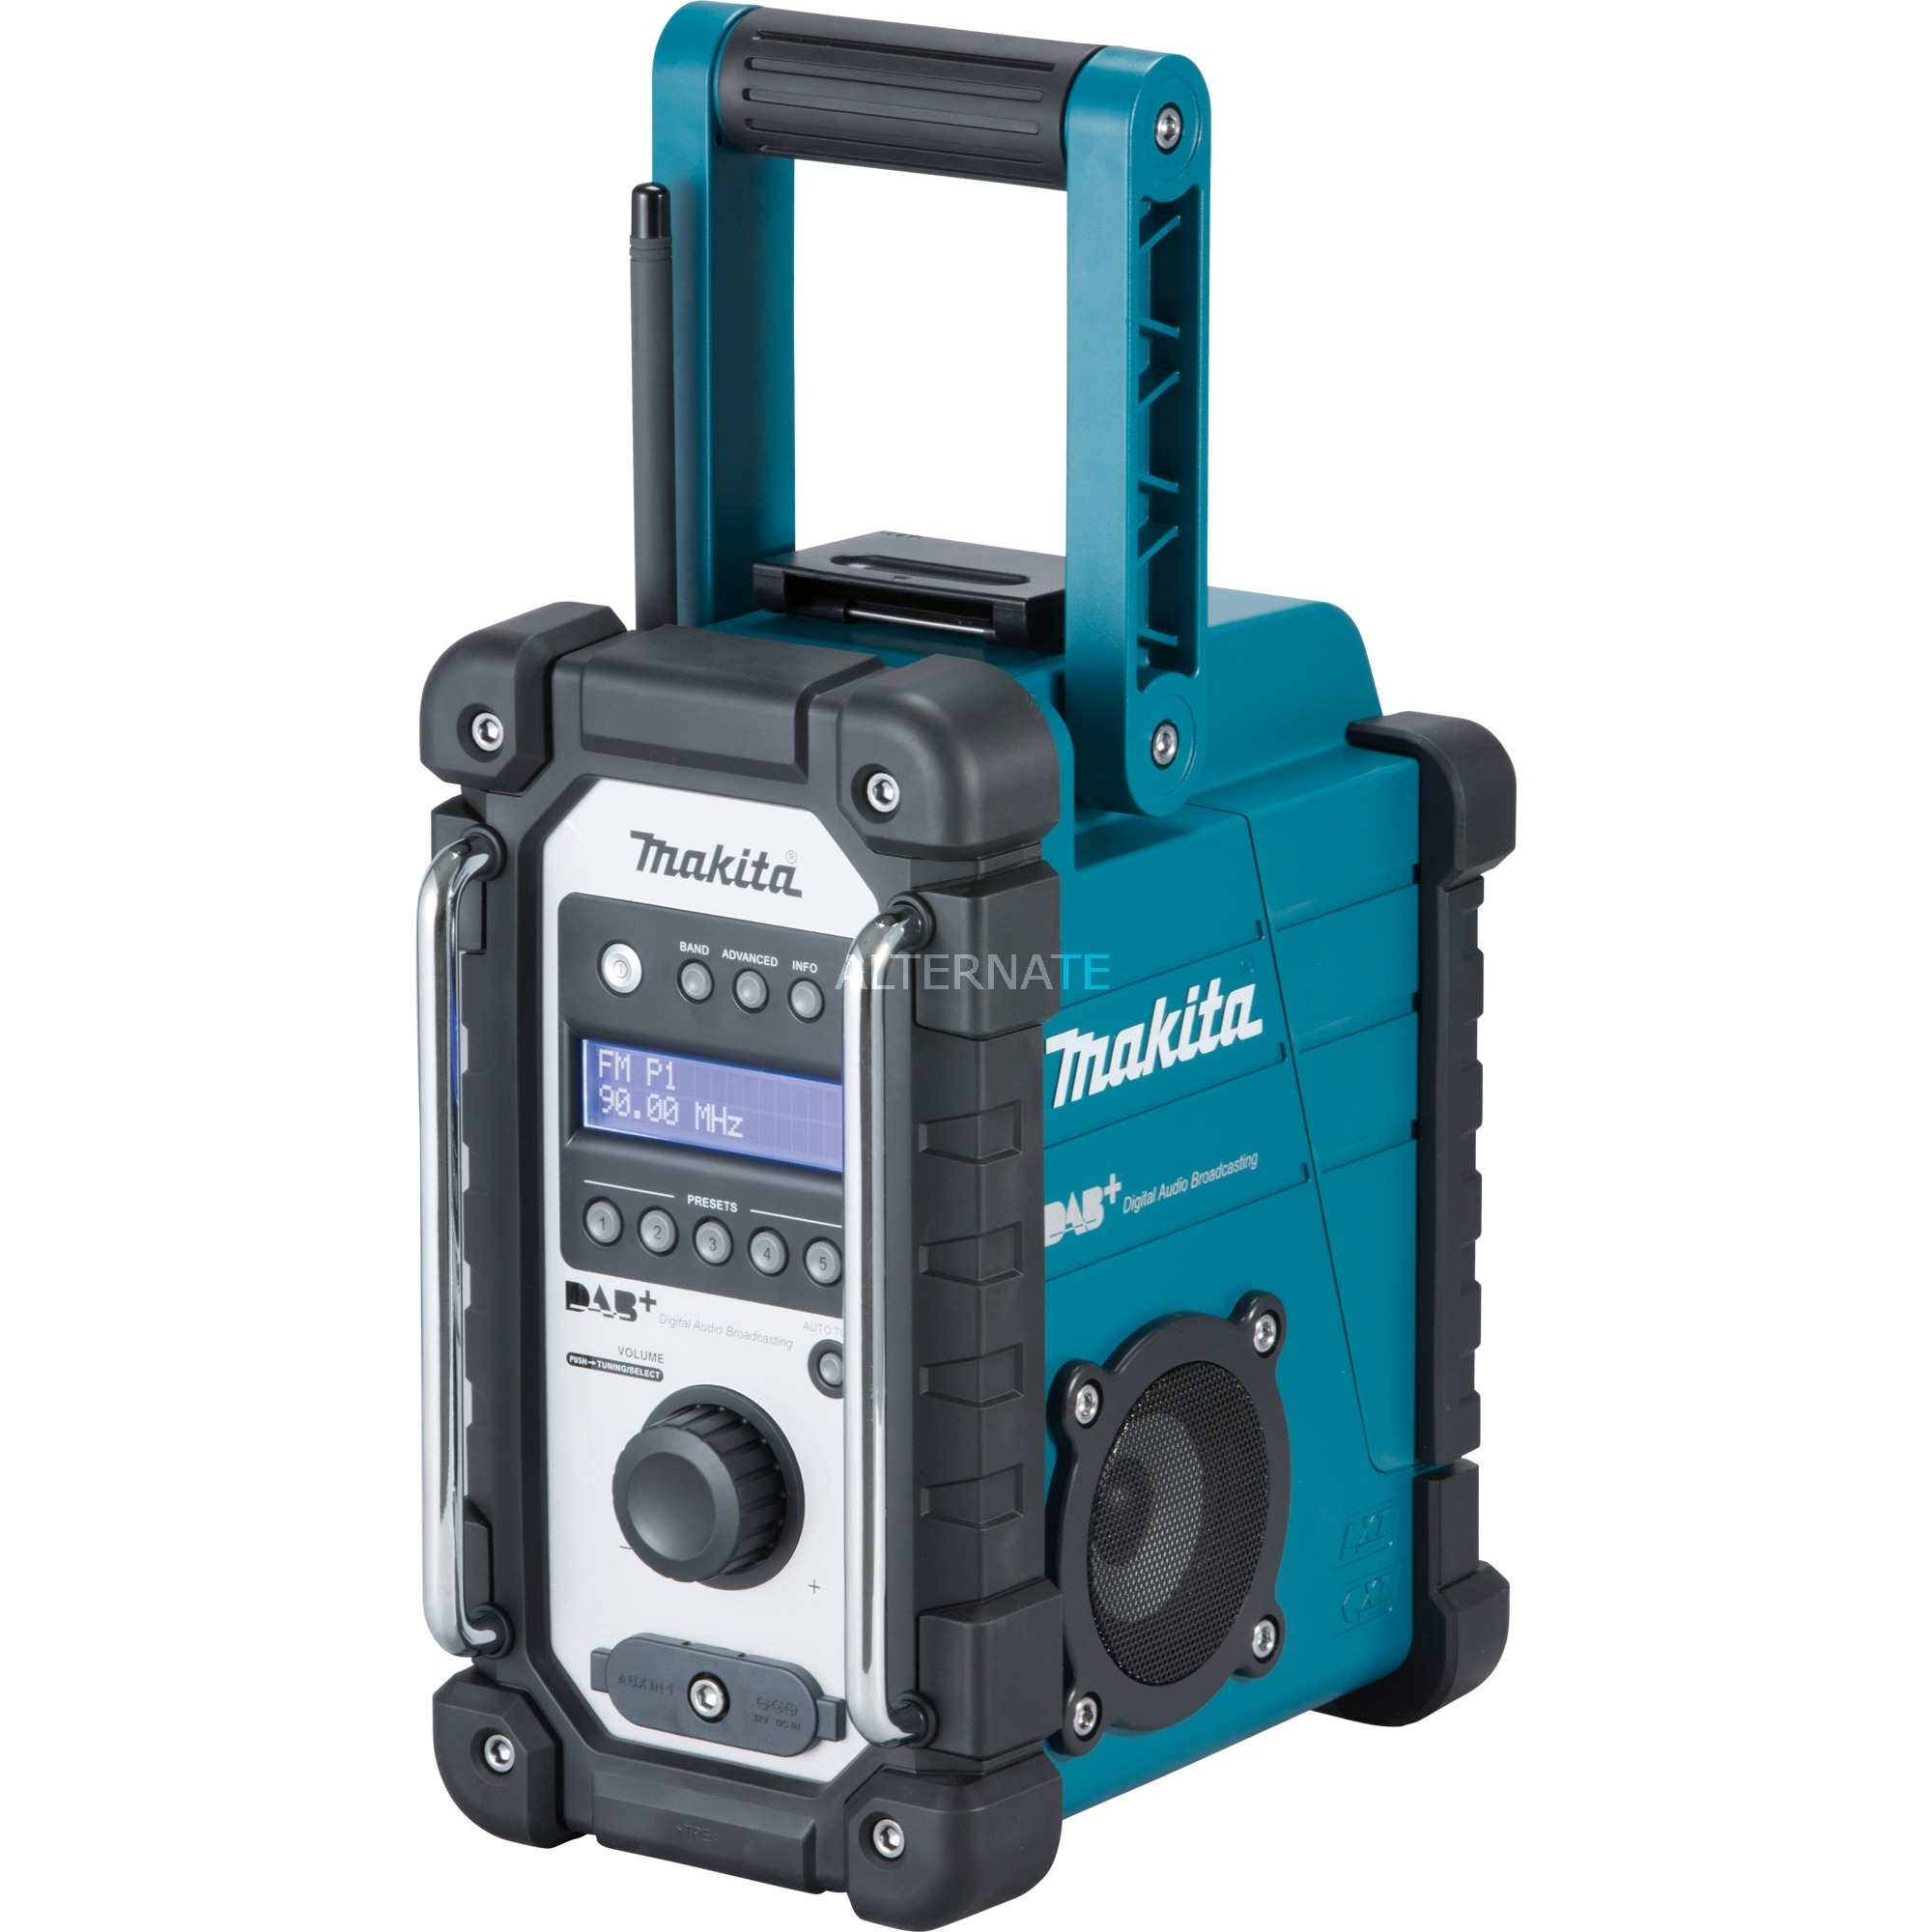 dmr110-job-site-radio